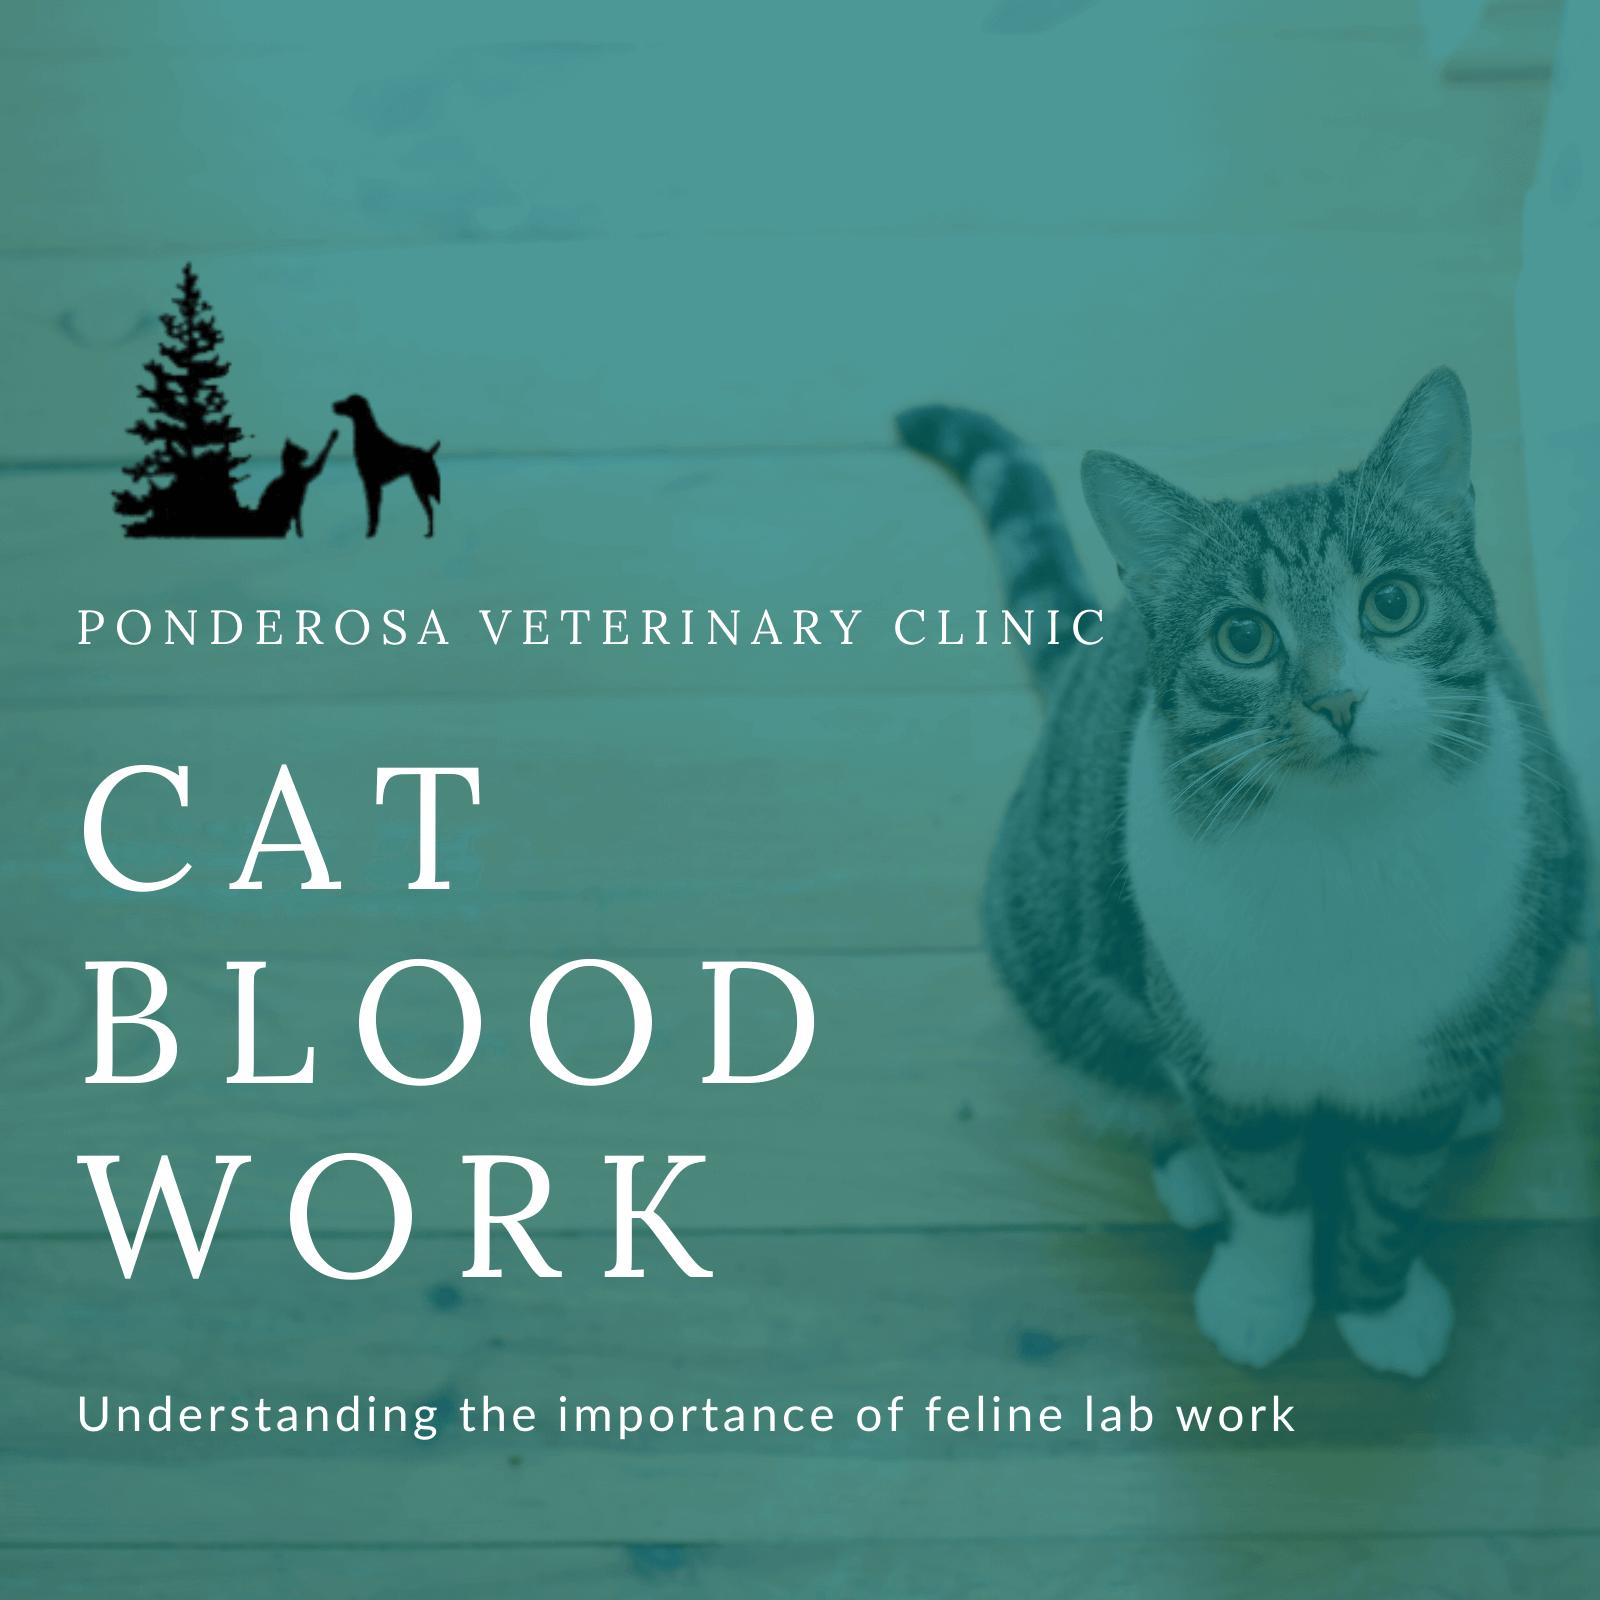 cat blood work blog